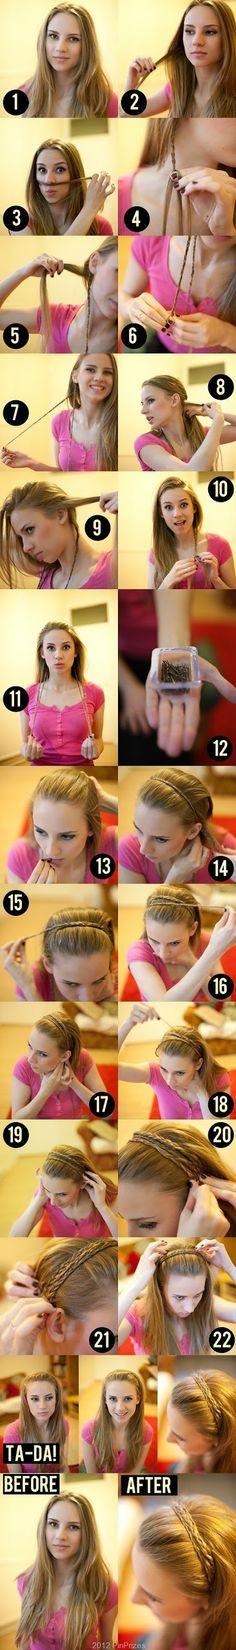 braid your hair and use it as a headband | Beauty tutorials